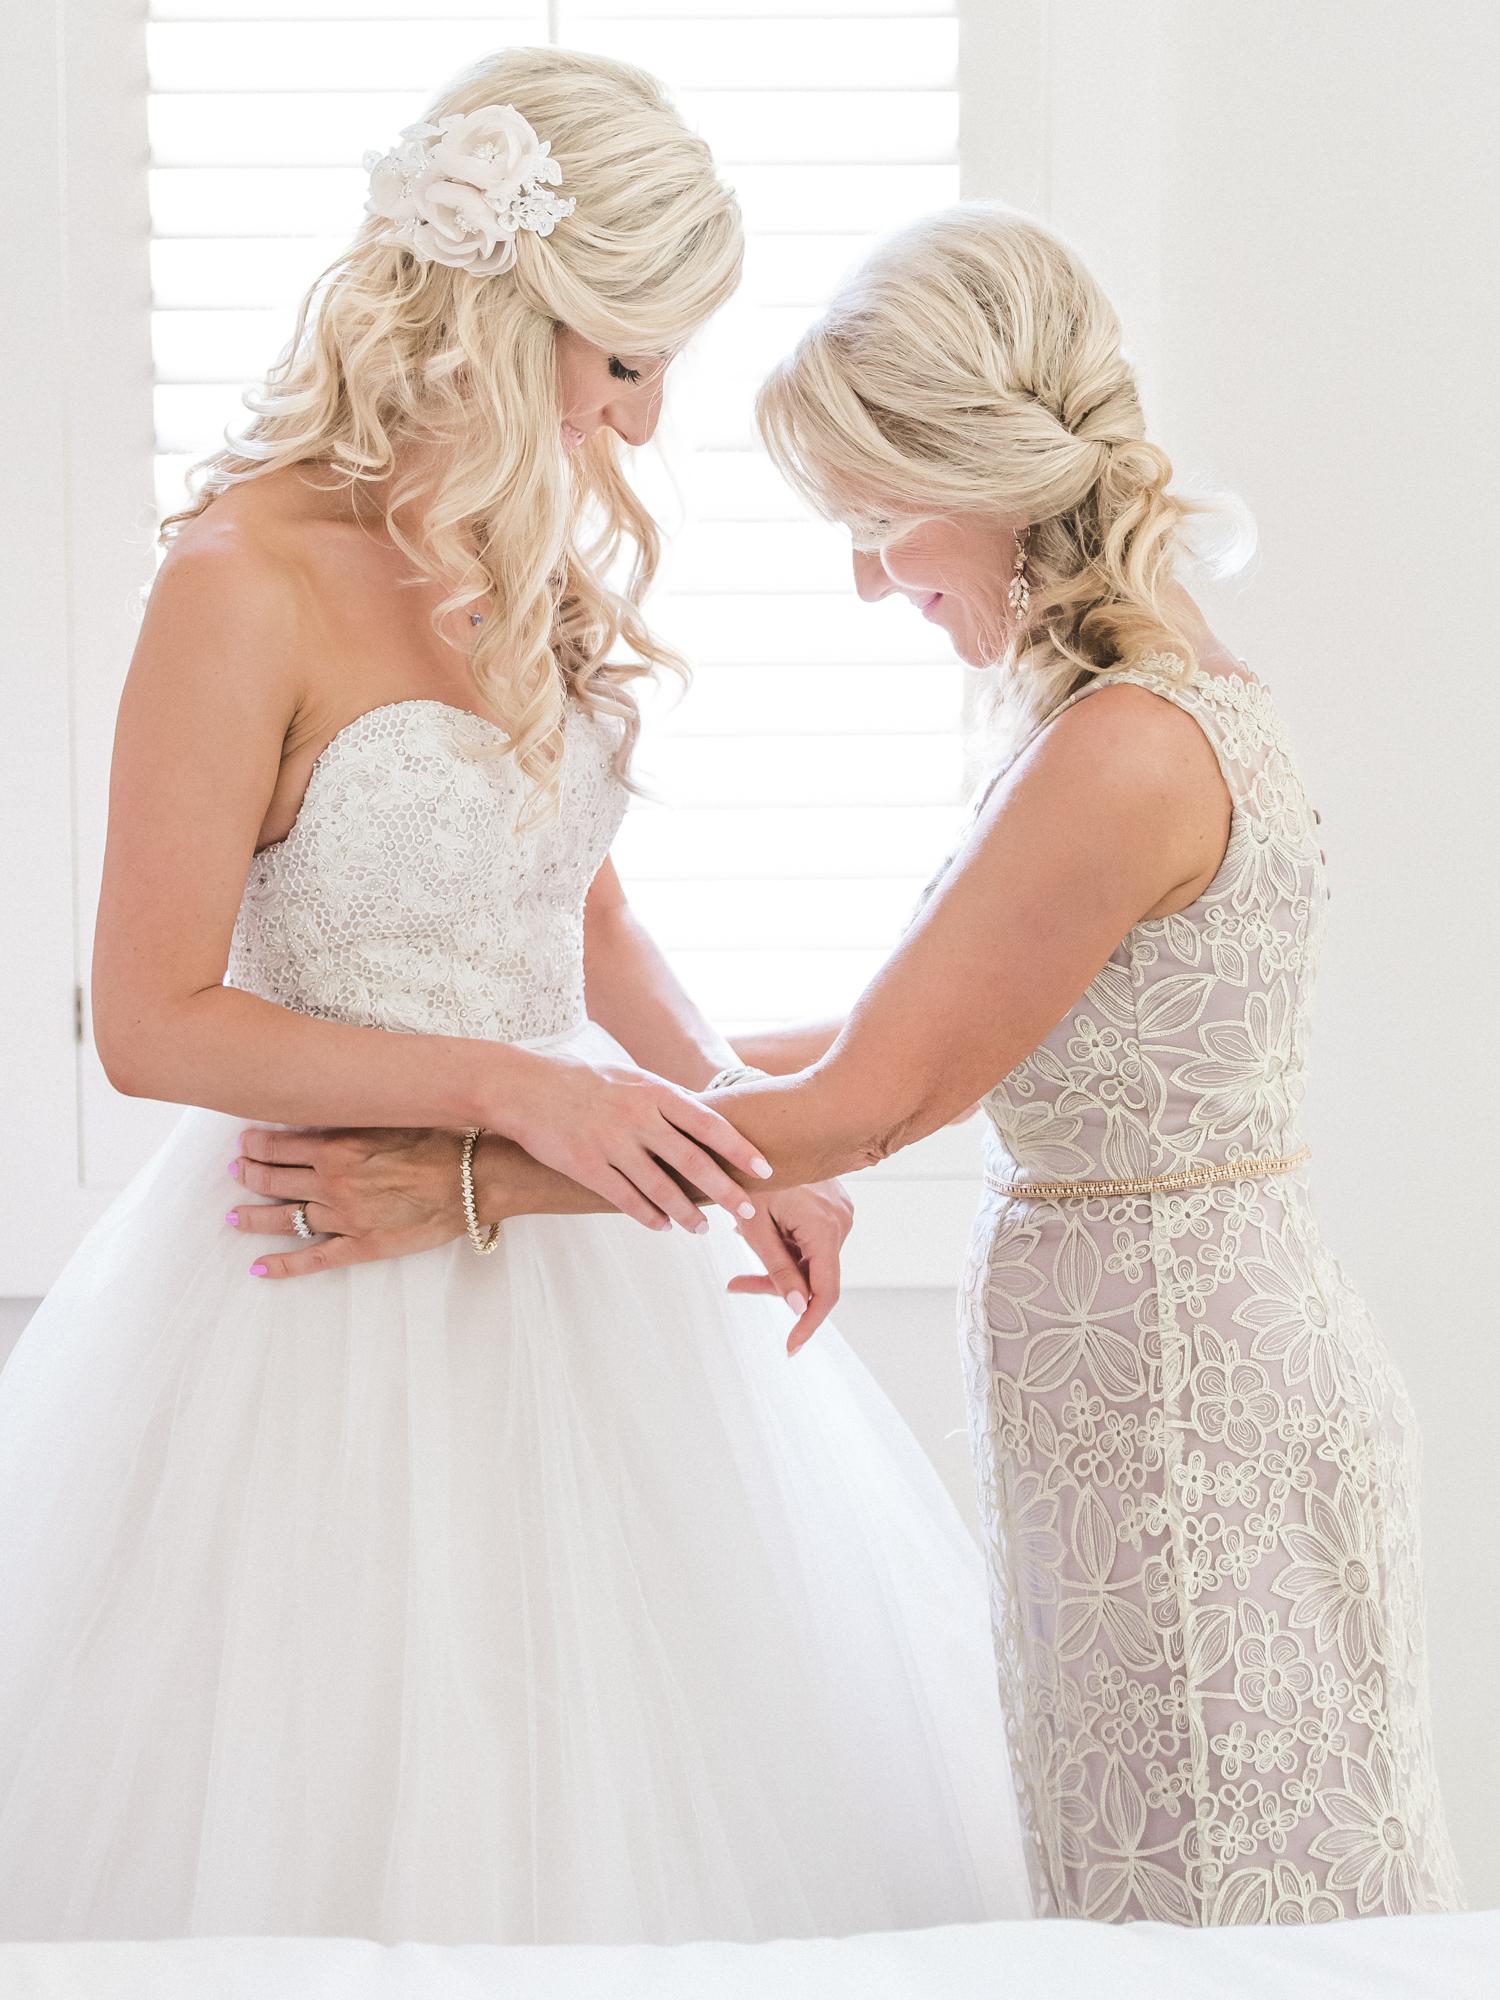 Aimee+Logan_wedding_spp-16.jpg